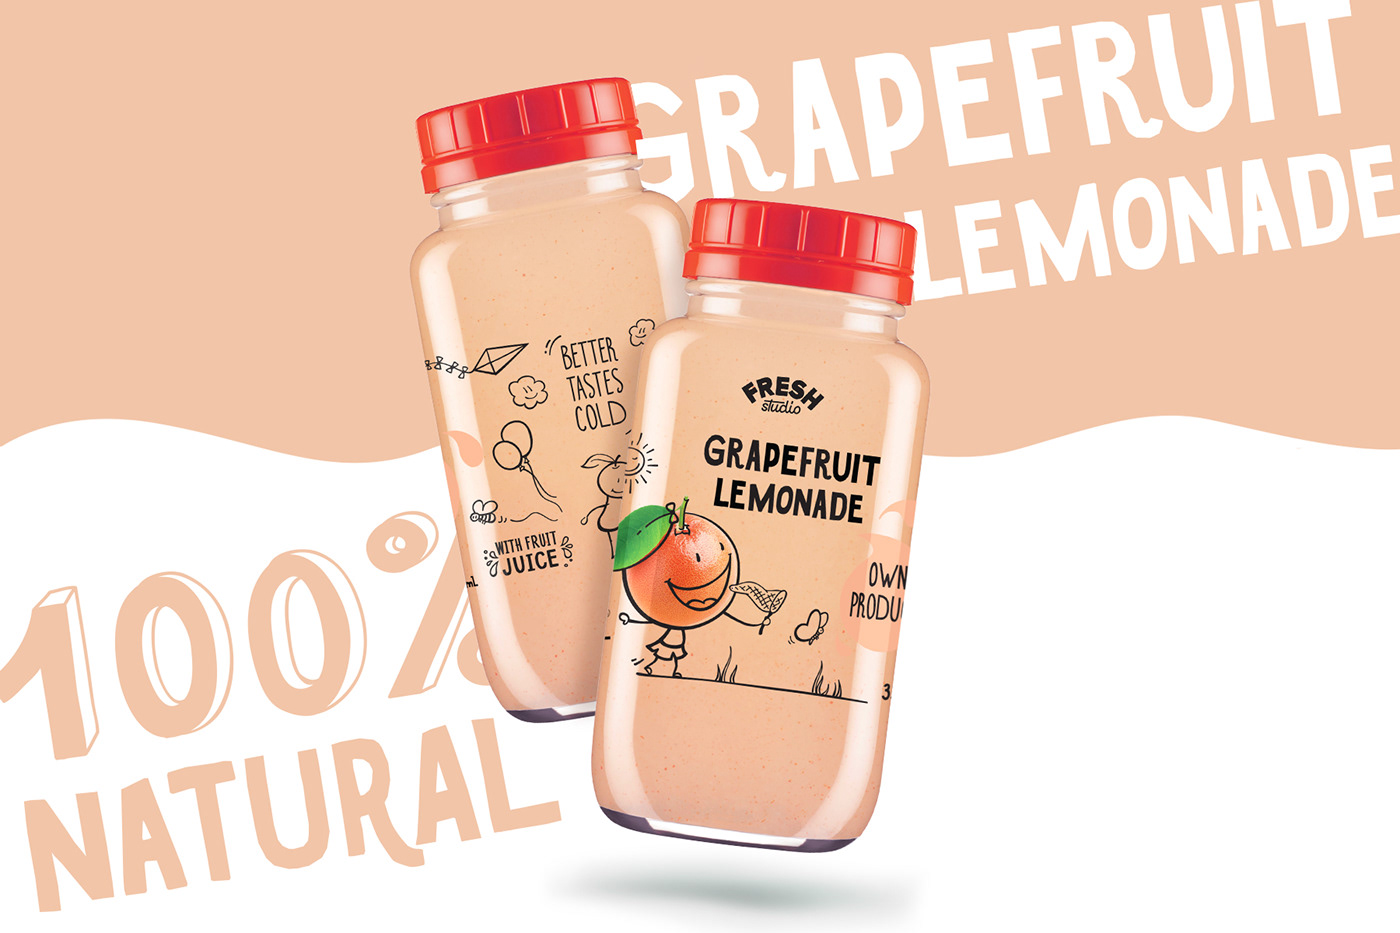 Label drink lemonade bottle fresh typography   beverage juice ILLUSTRATION  cartoon character